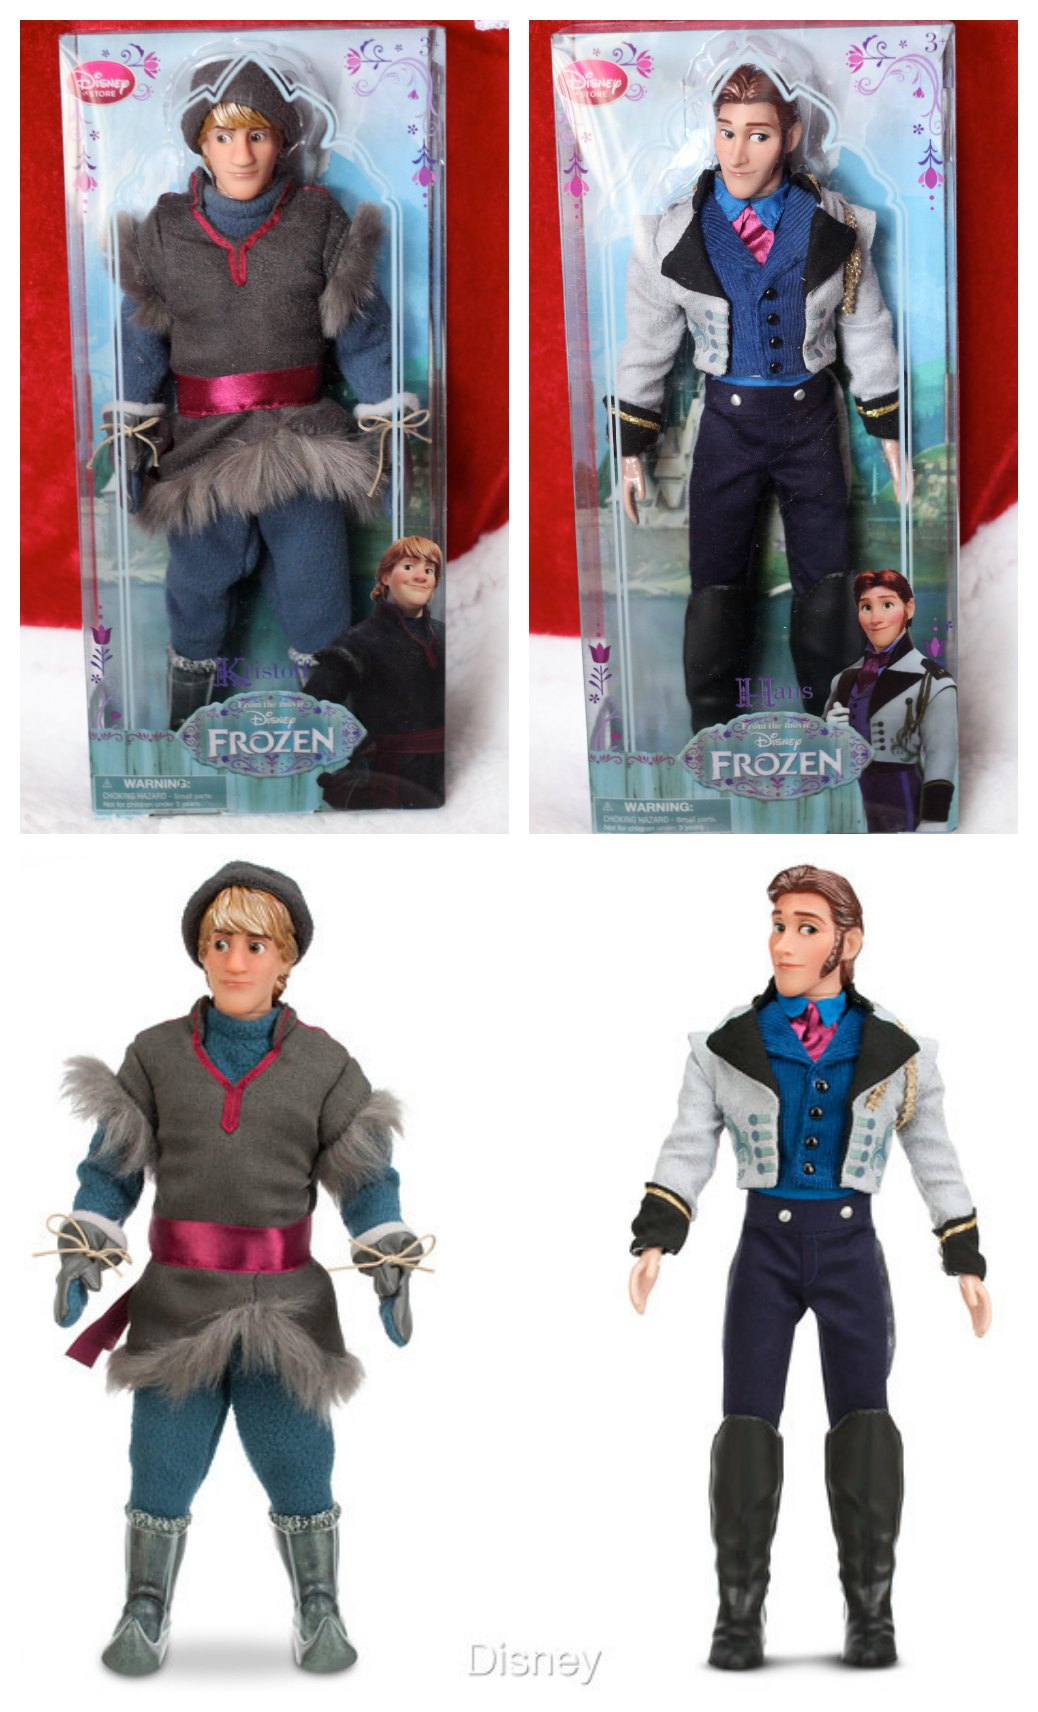 Disney Toys For Boys : Disney frozen toys for boys great holiday gift ideas